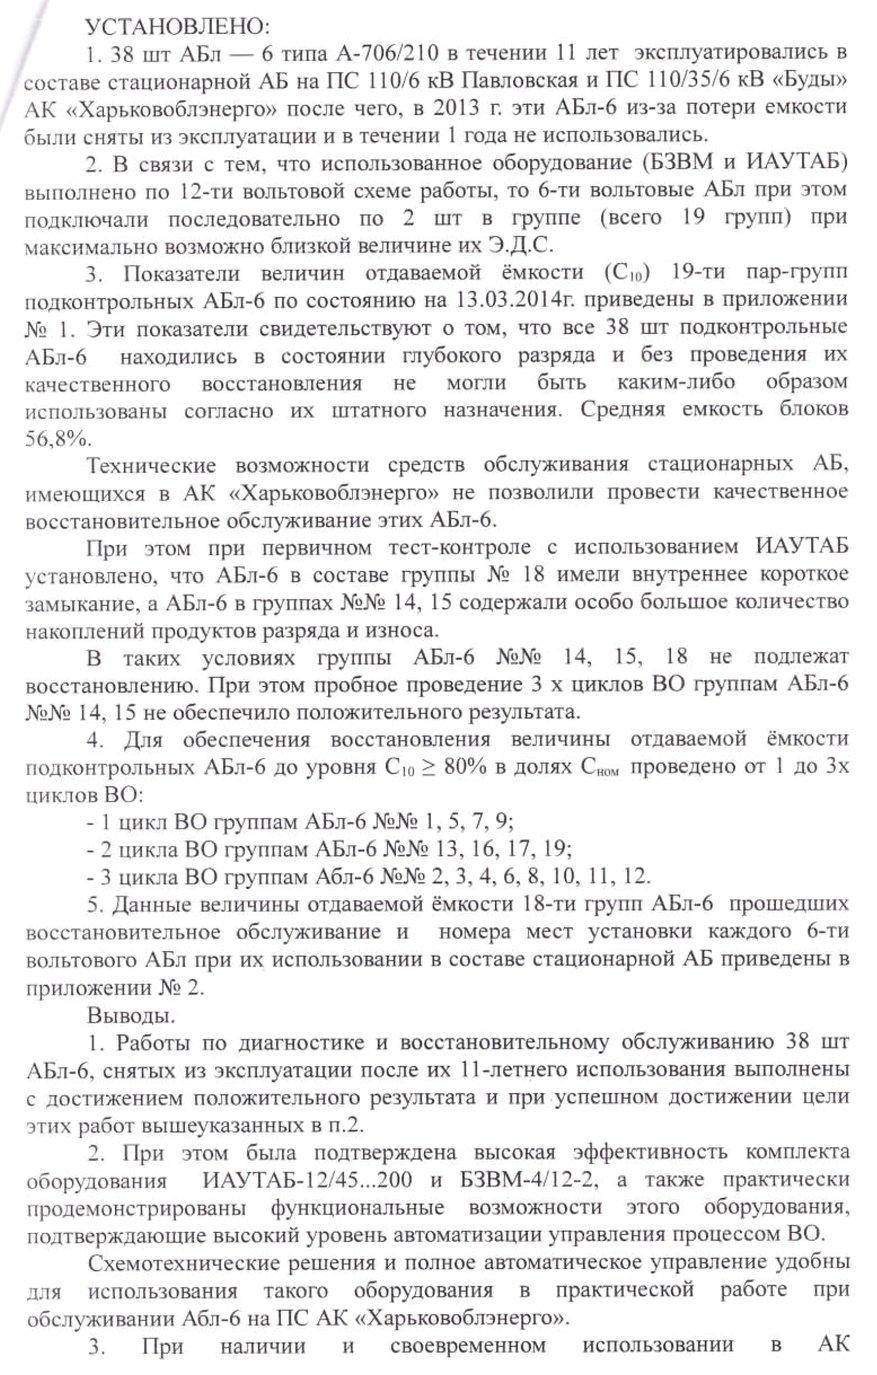 materialyi_akta-otchyota_2.jpg (877×1375)